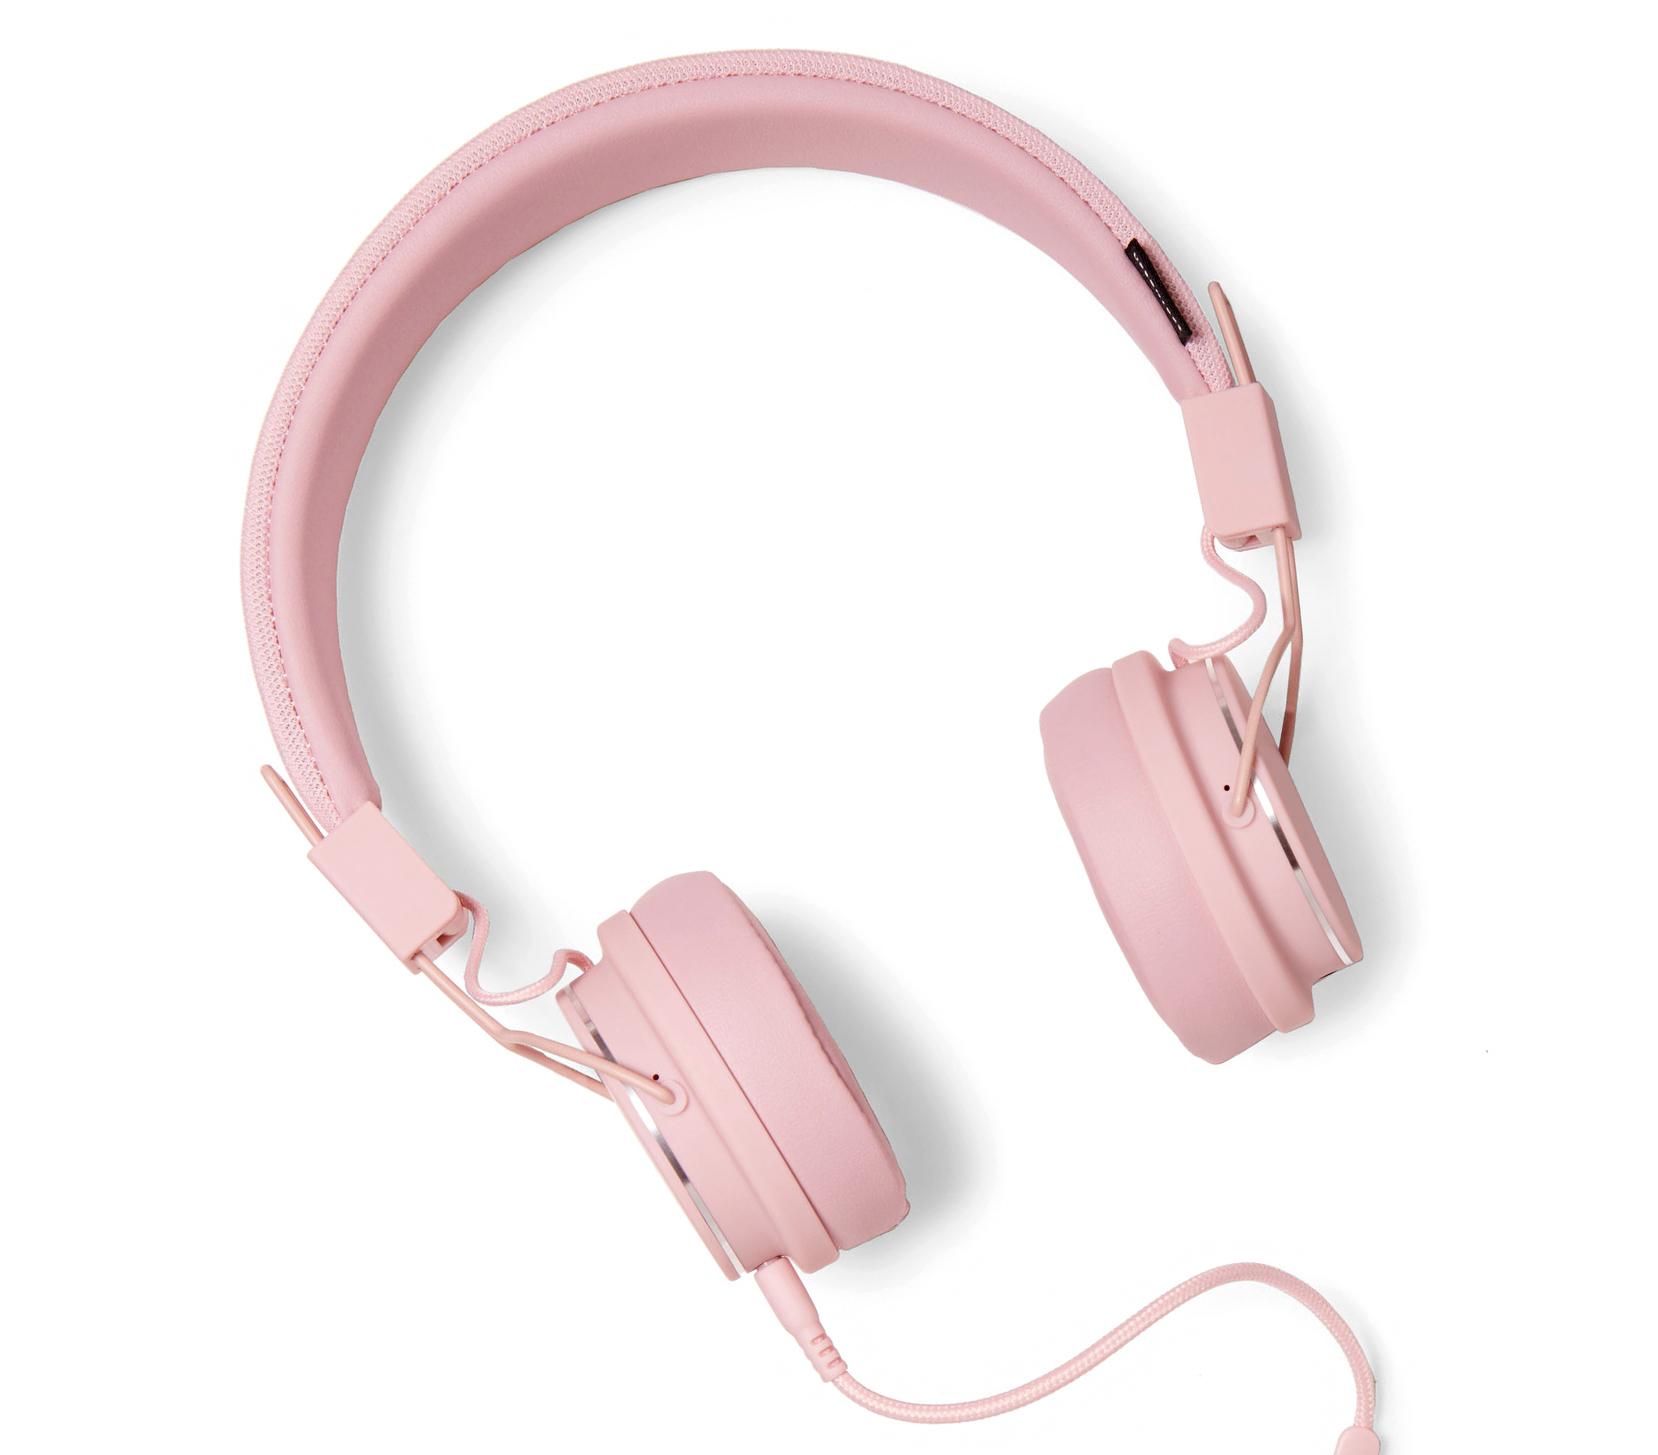 urbanears plattan 2 powder pink headphones